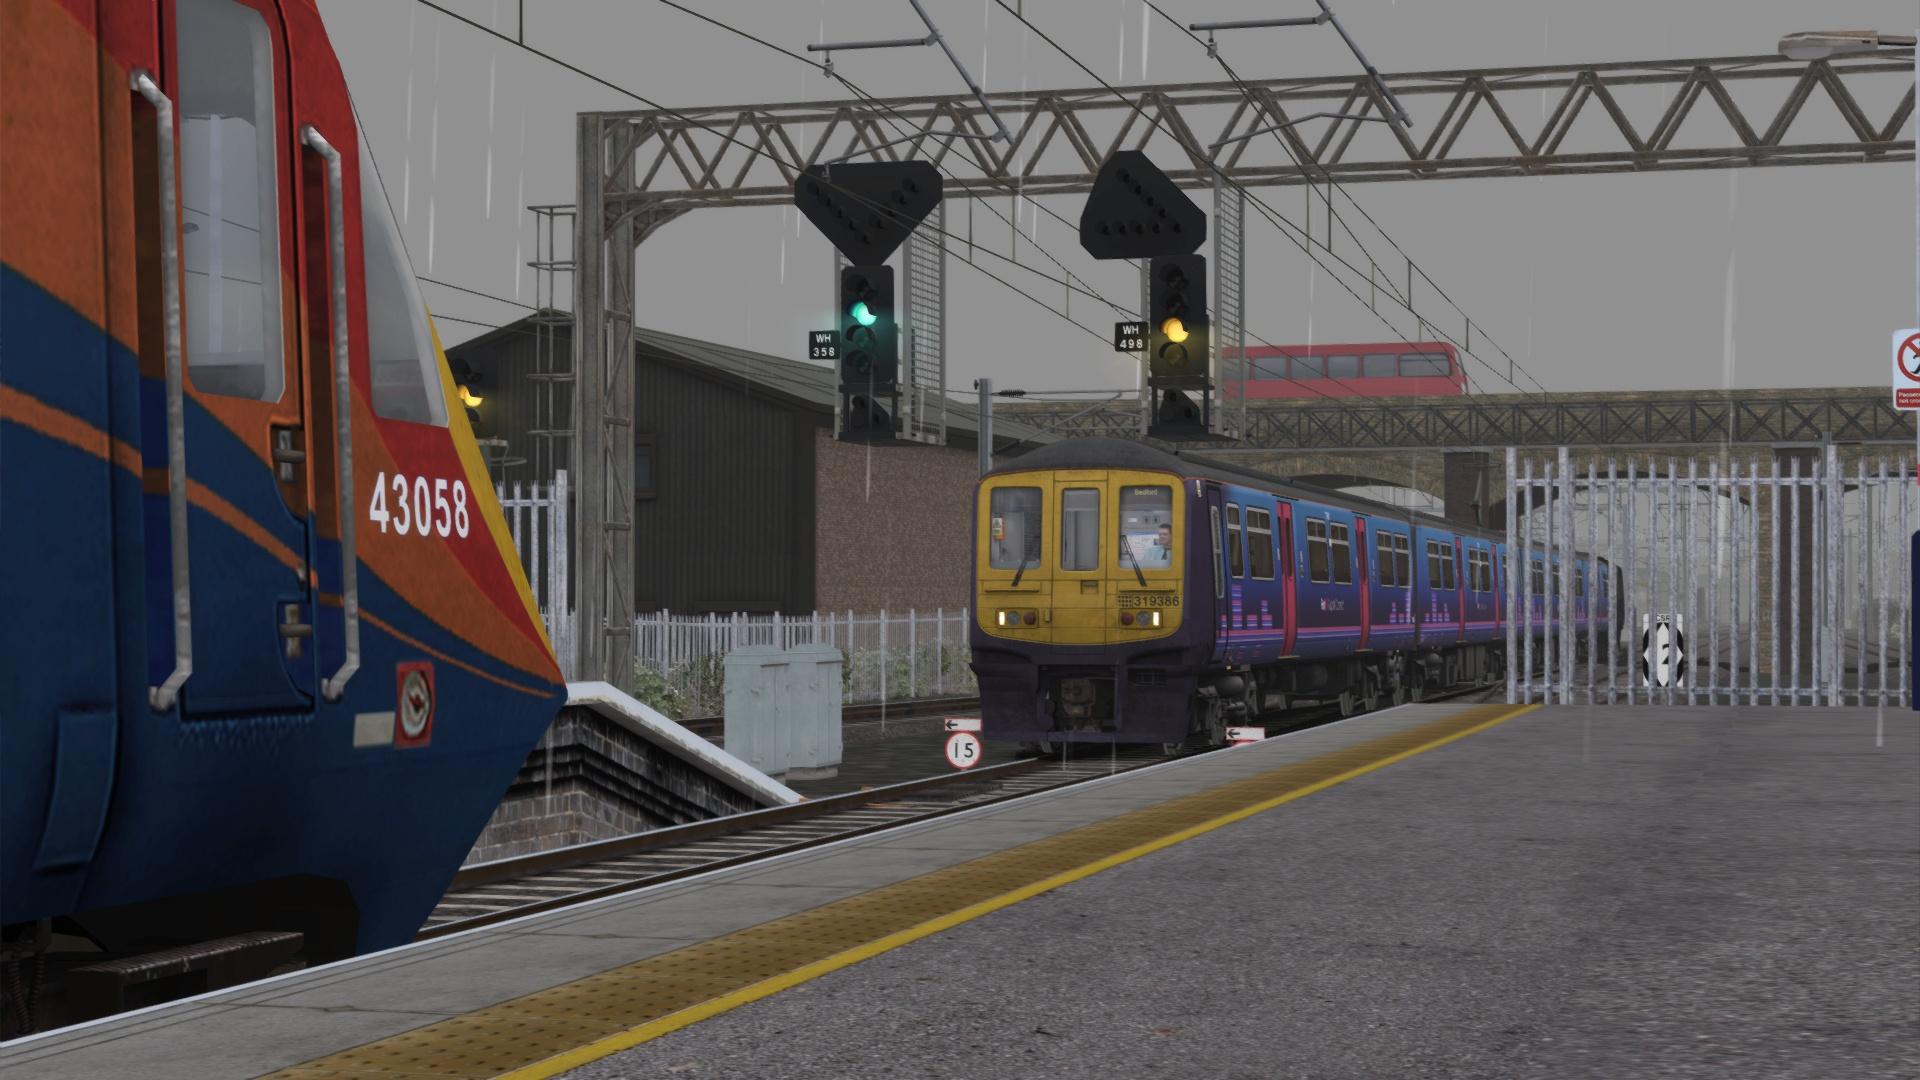 Train fares nottingham to london st pancras